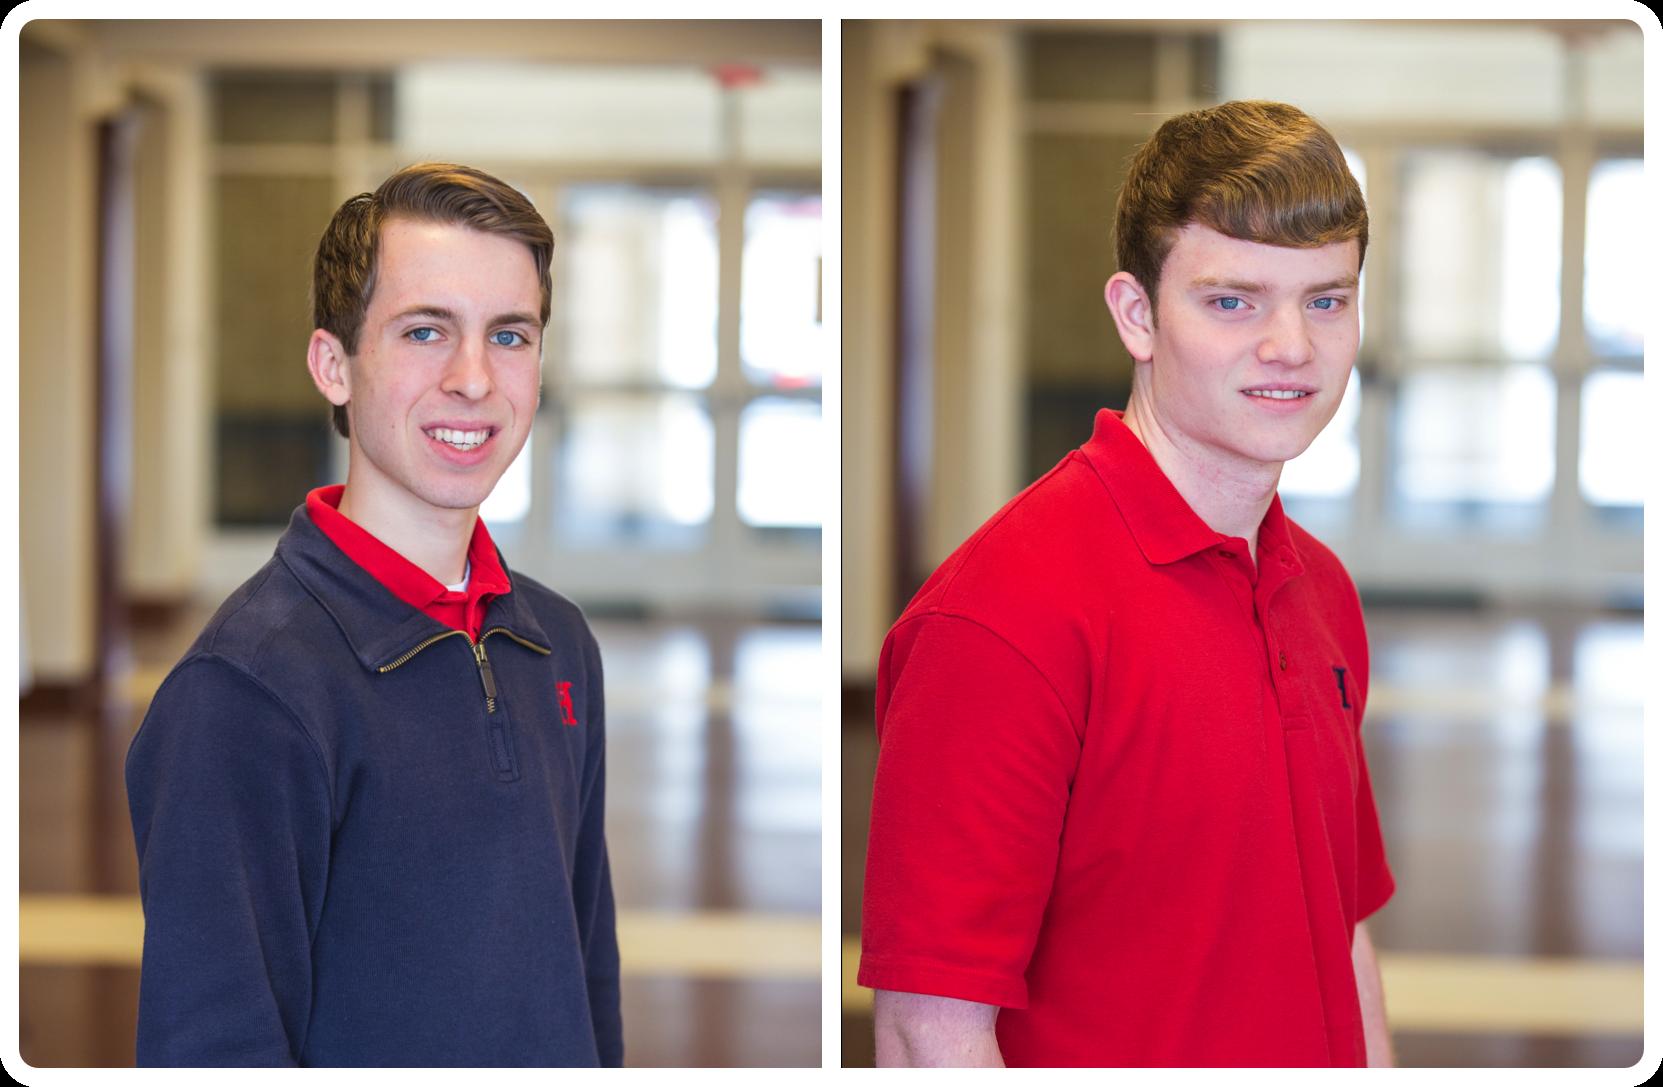 (LEFT) Valedictorian, Zach Riedel (RIGHT) Salutatorian, Robert Mihalko